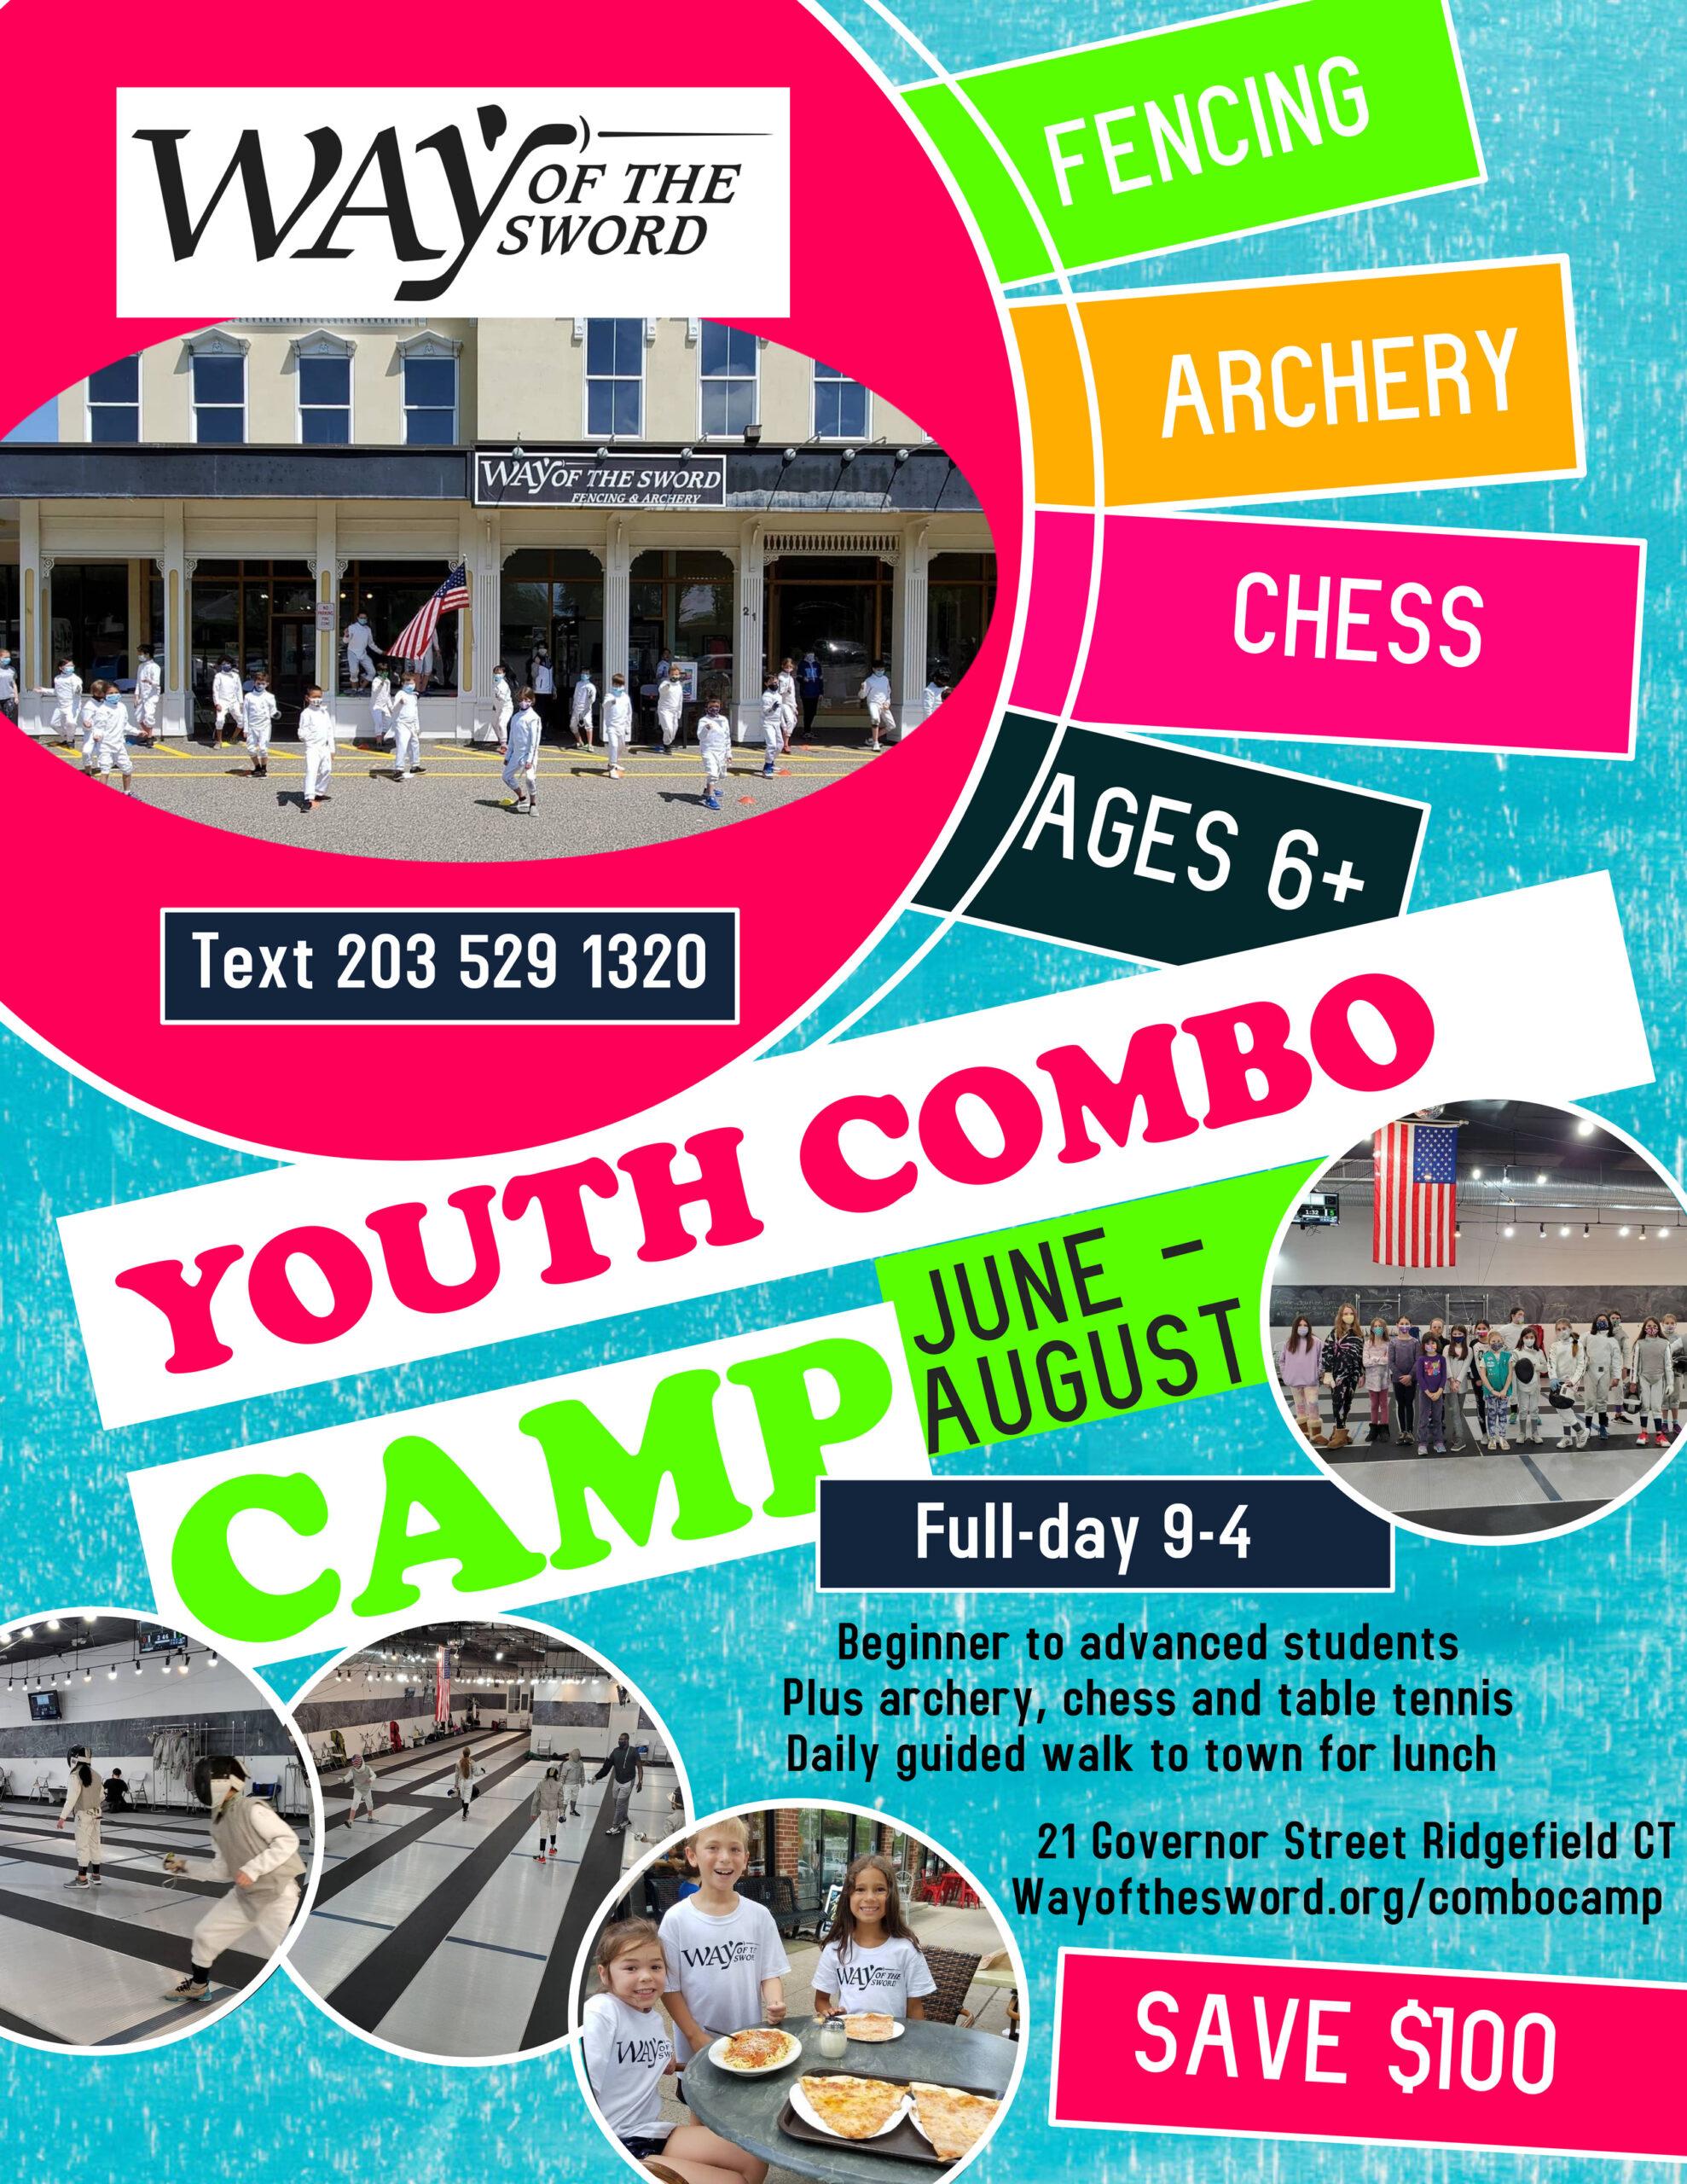 Combo Camp fencing flyer WAY (1)